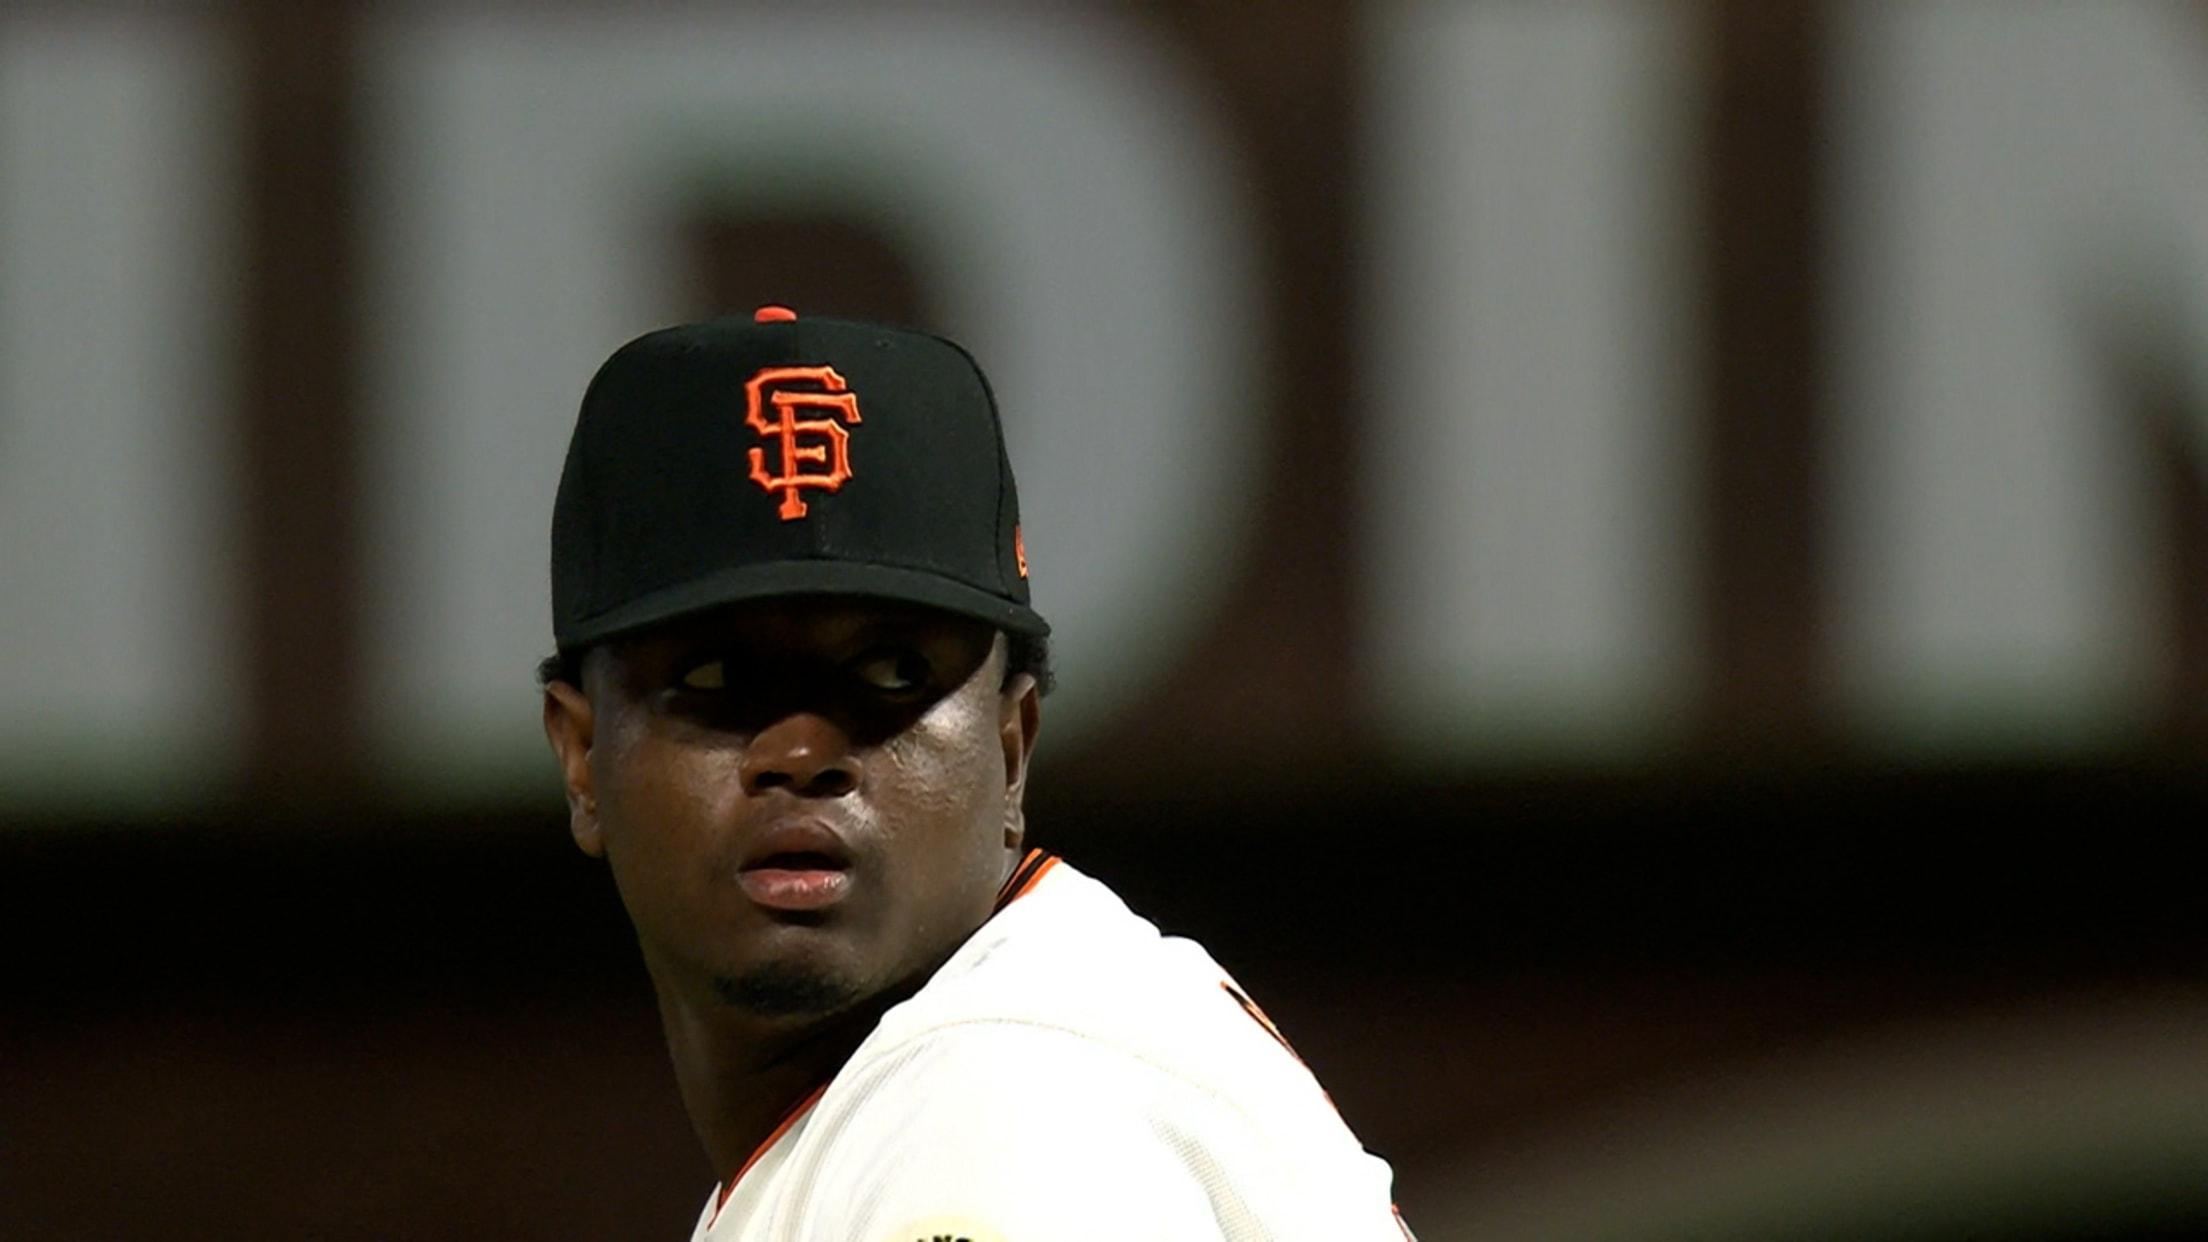 Gregory Santos' MLB debut